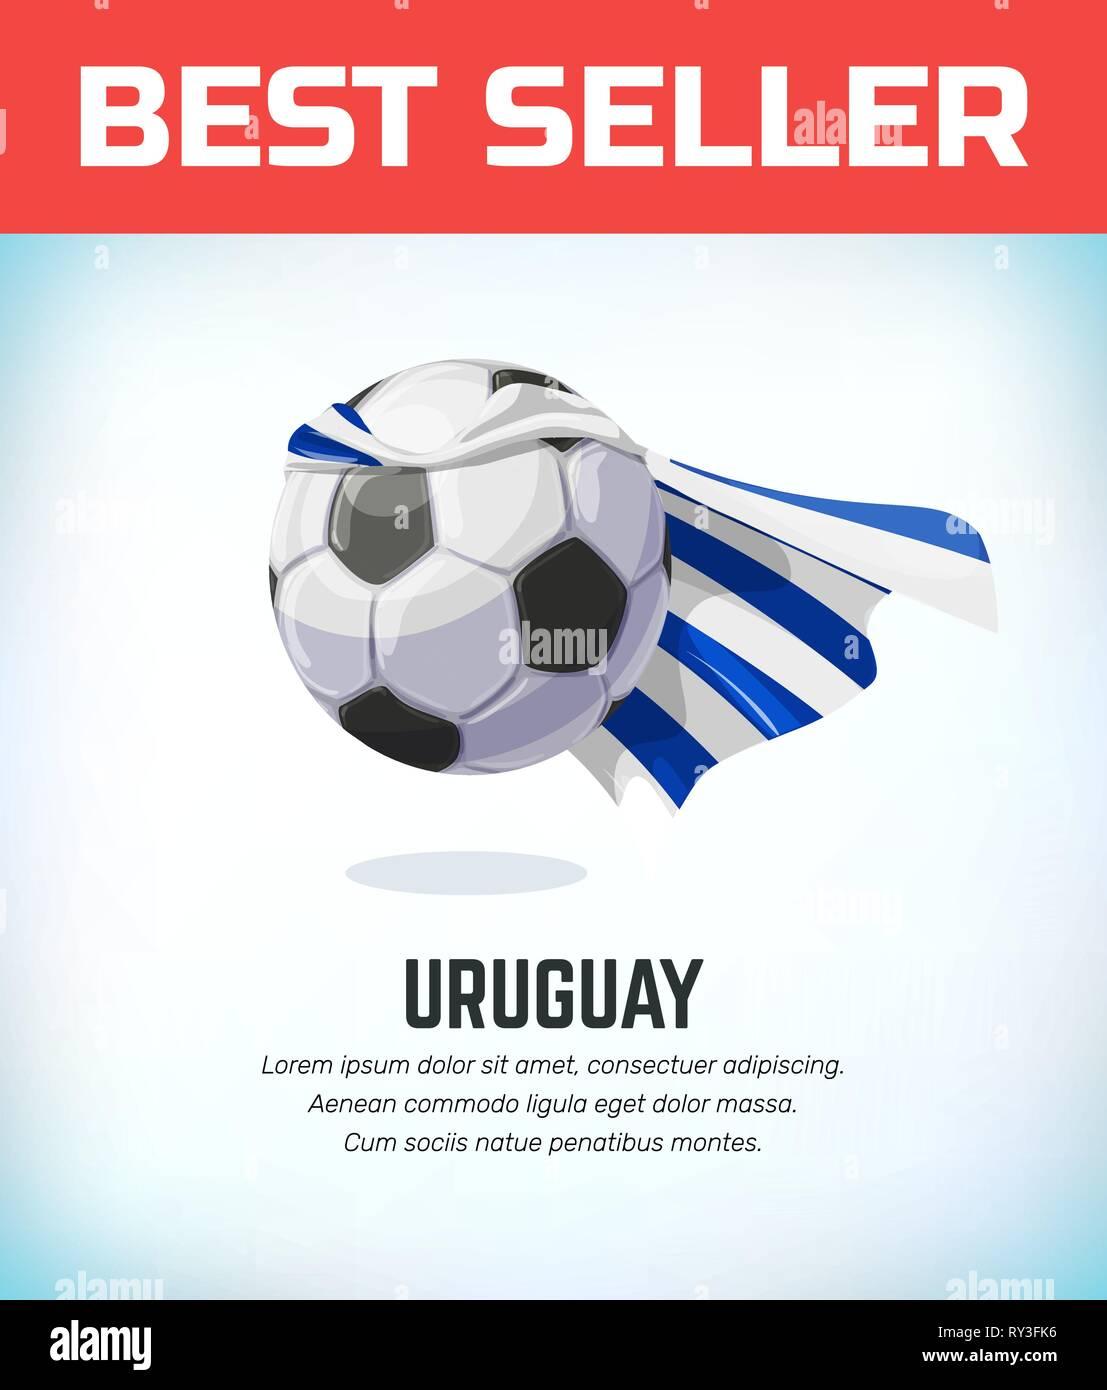 62d70850086 Uruguay football or soccer ball. Football national team. Vector illustration  - Stock Image